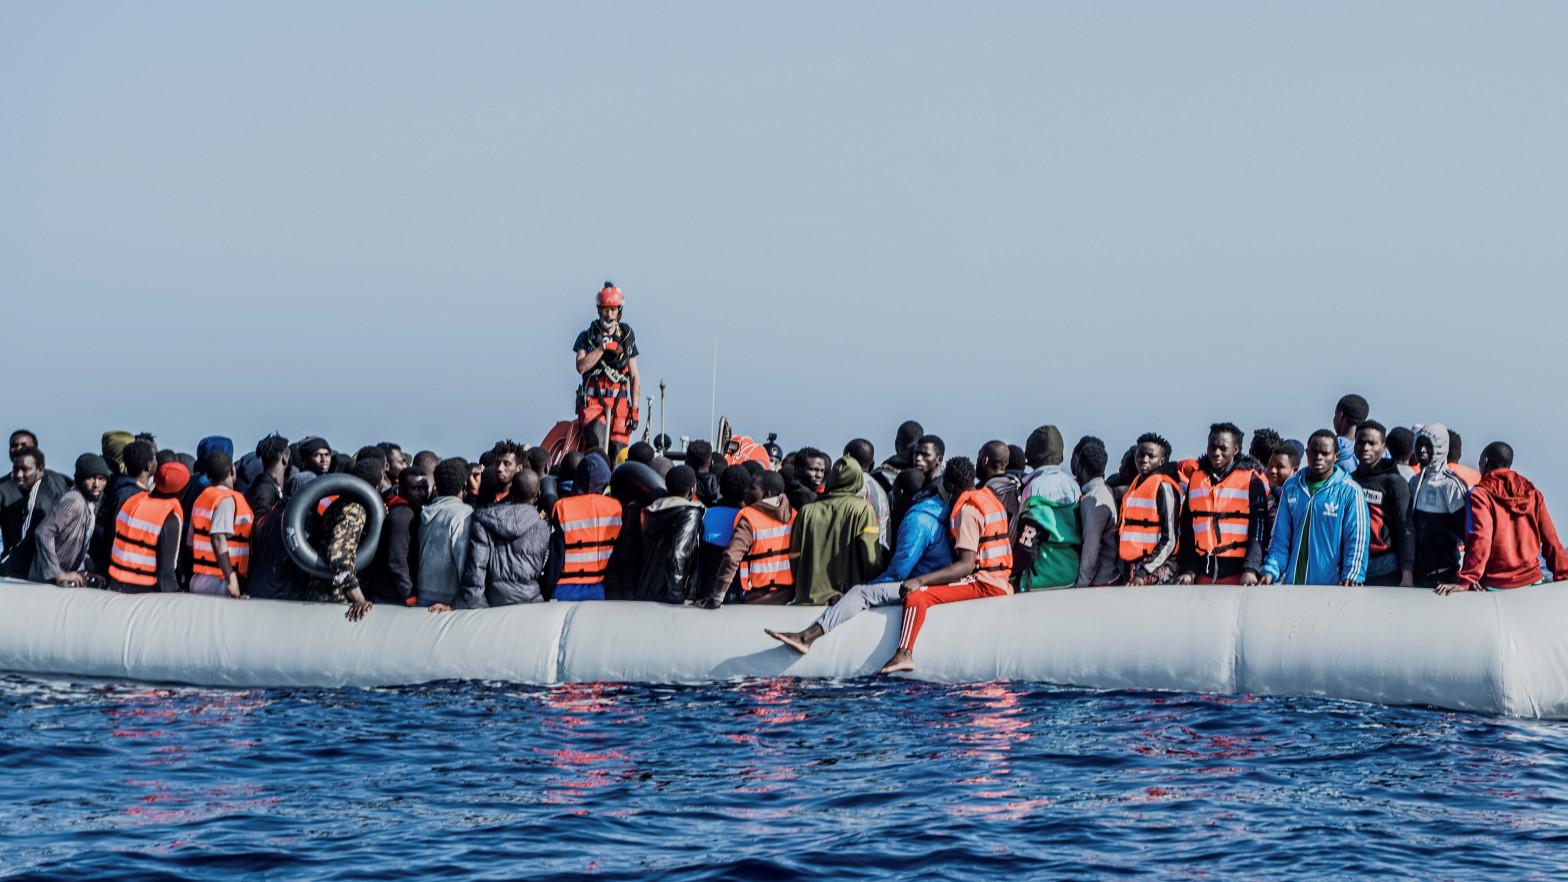 El buque 'Ocean Viking' rescata a 236 migrantes frente a la costa de Libia